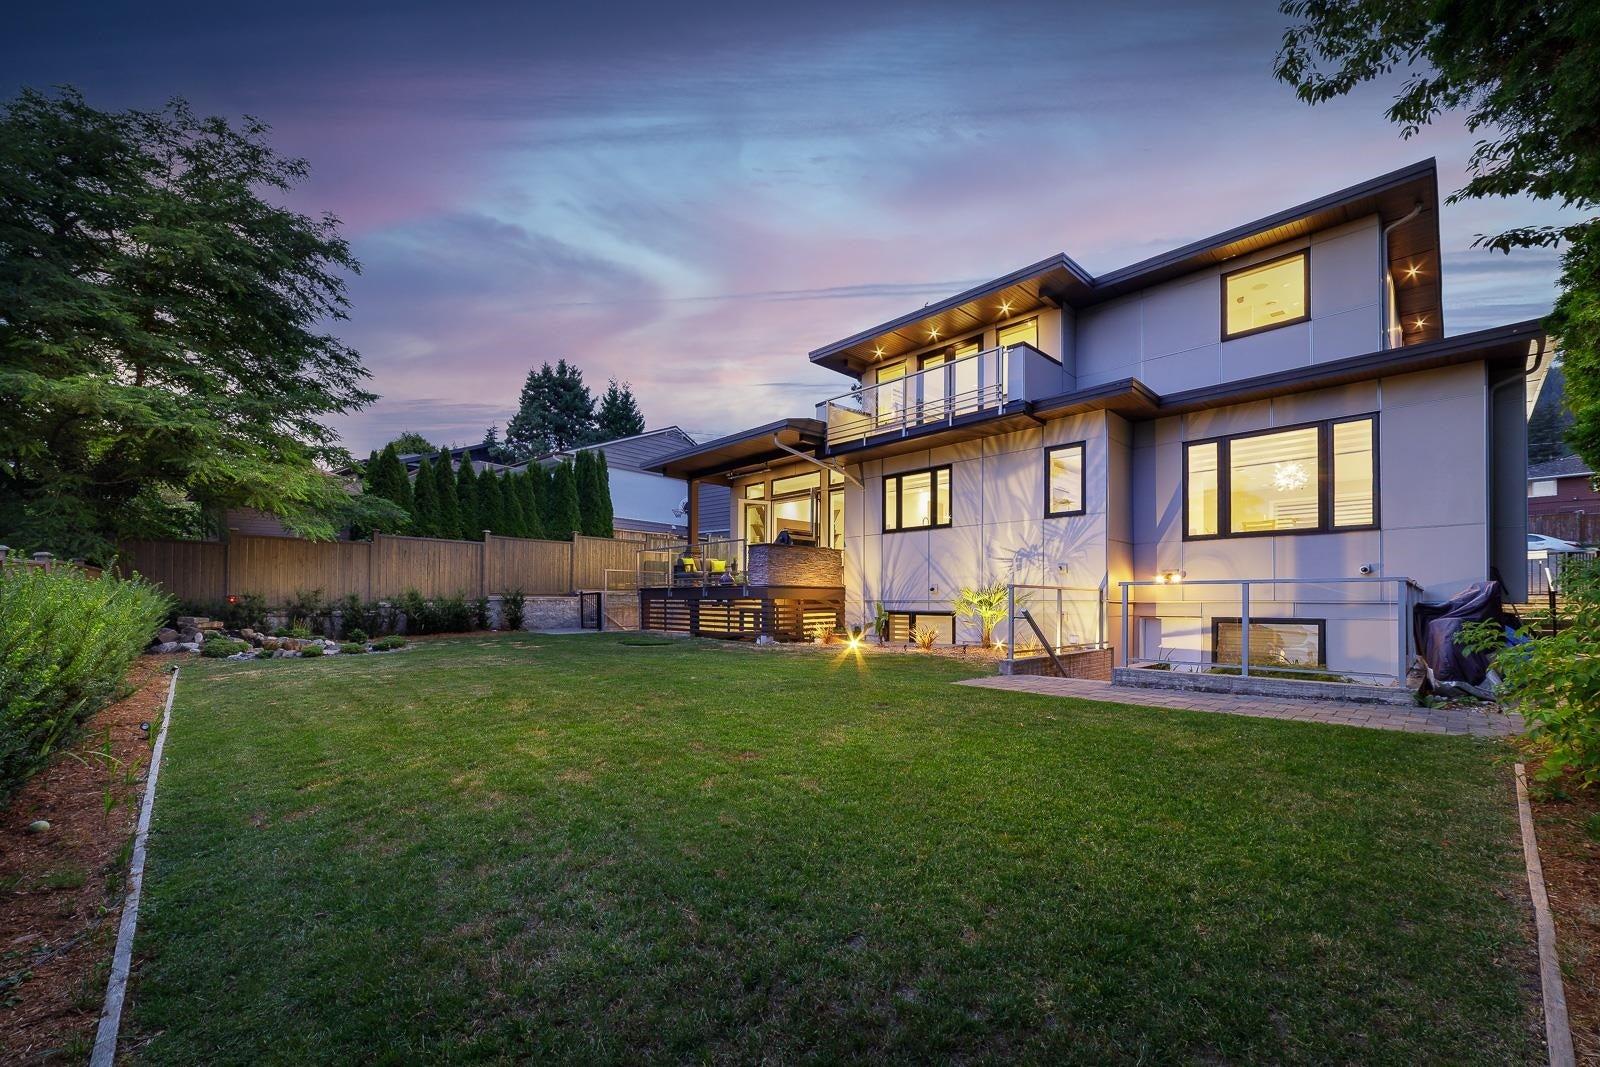 517 GRANADA CRESCENT - Upper Delbrook House/Single Family for sale, 8 Bedrooms (R2615057) - #33